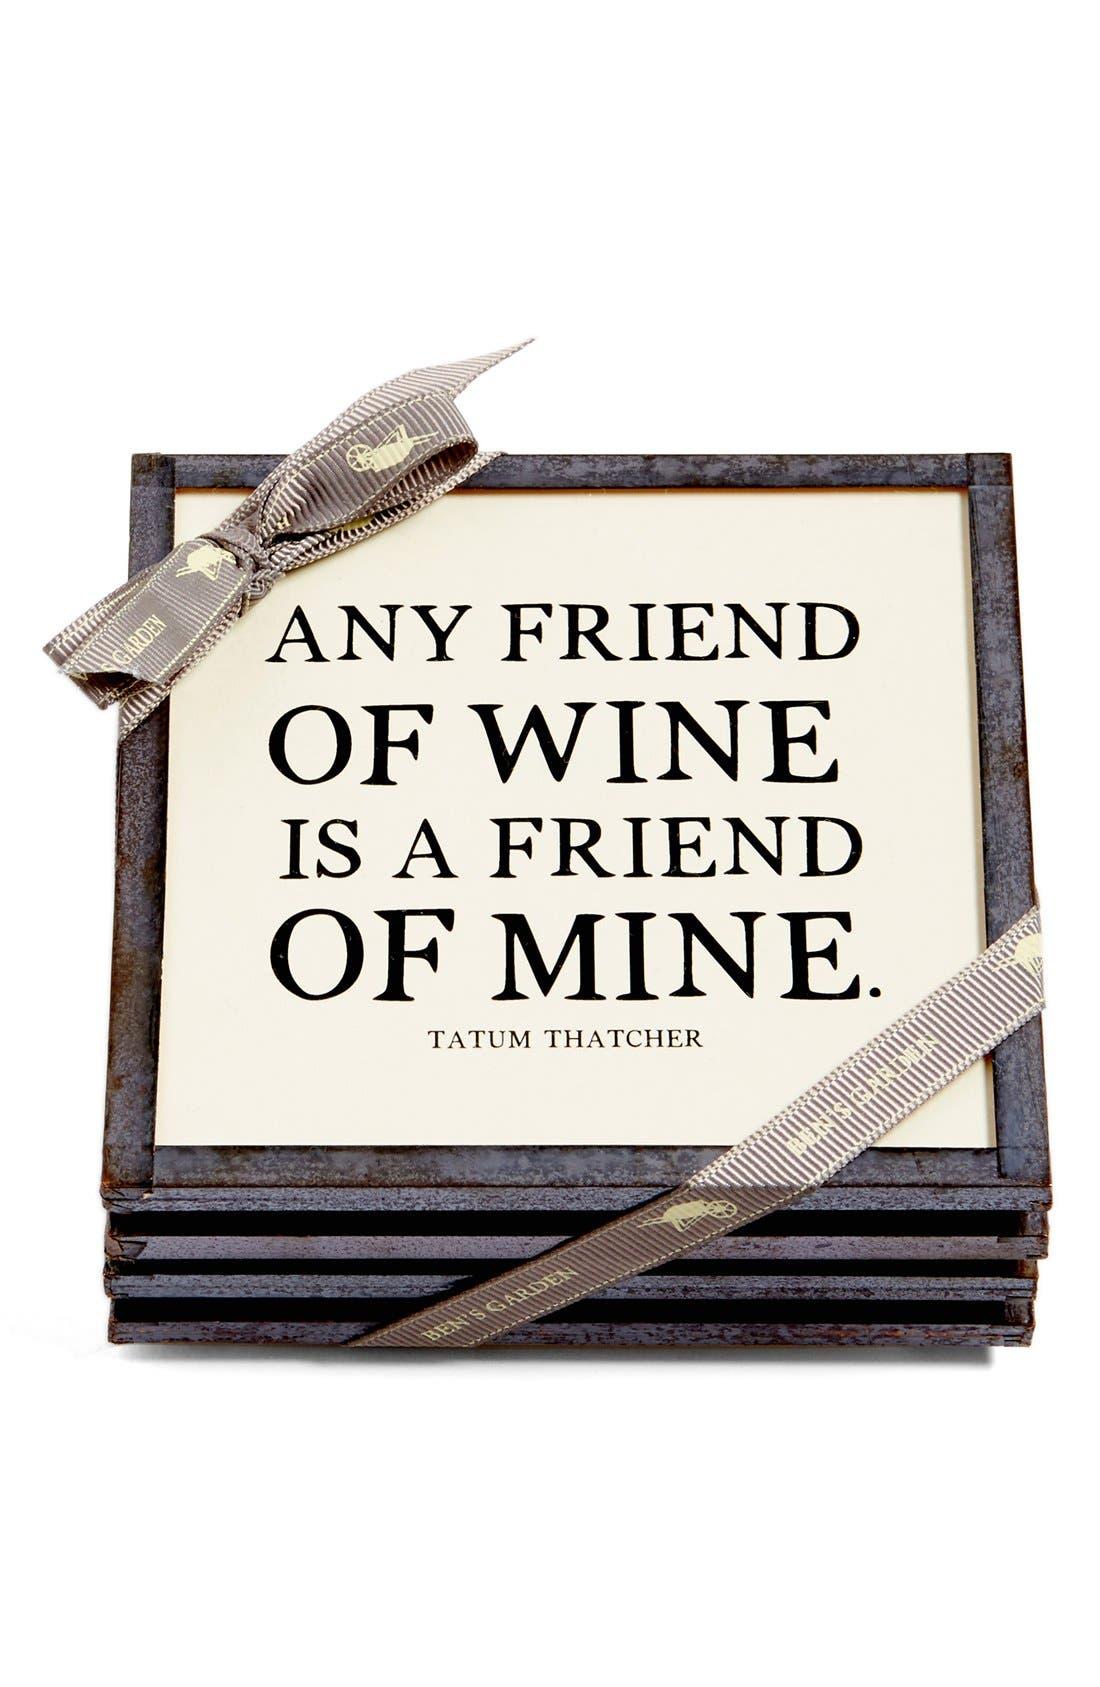 Ben's Garden 'Any Friend of Wine' Coasters (Set of 4)